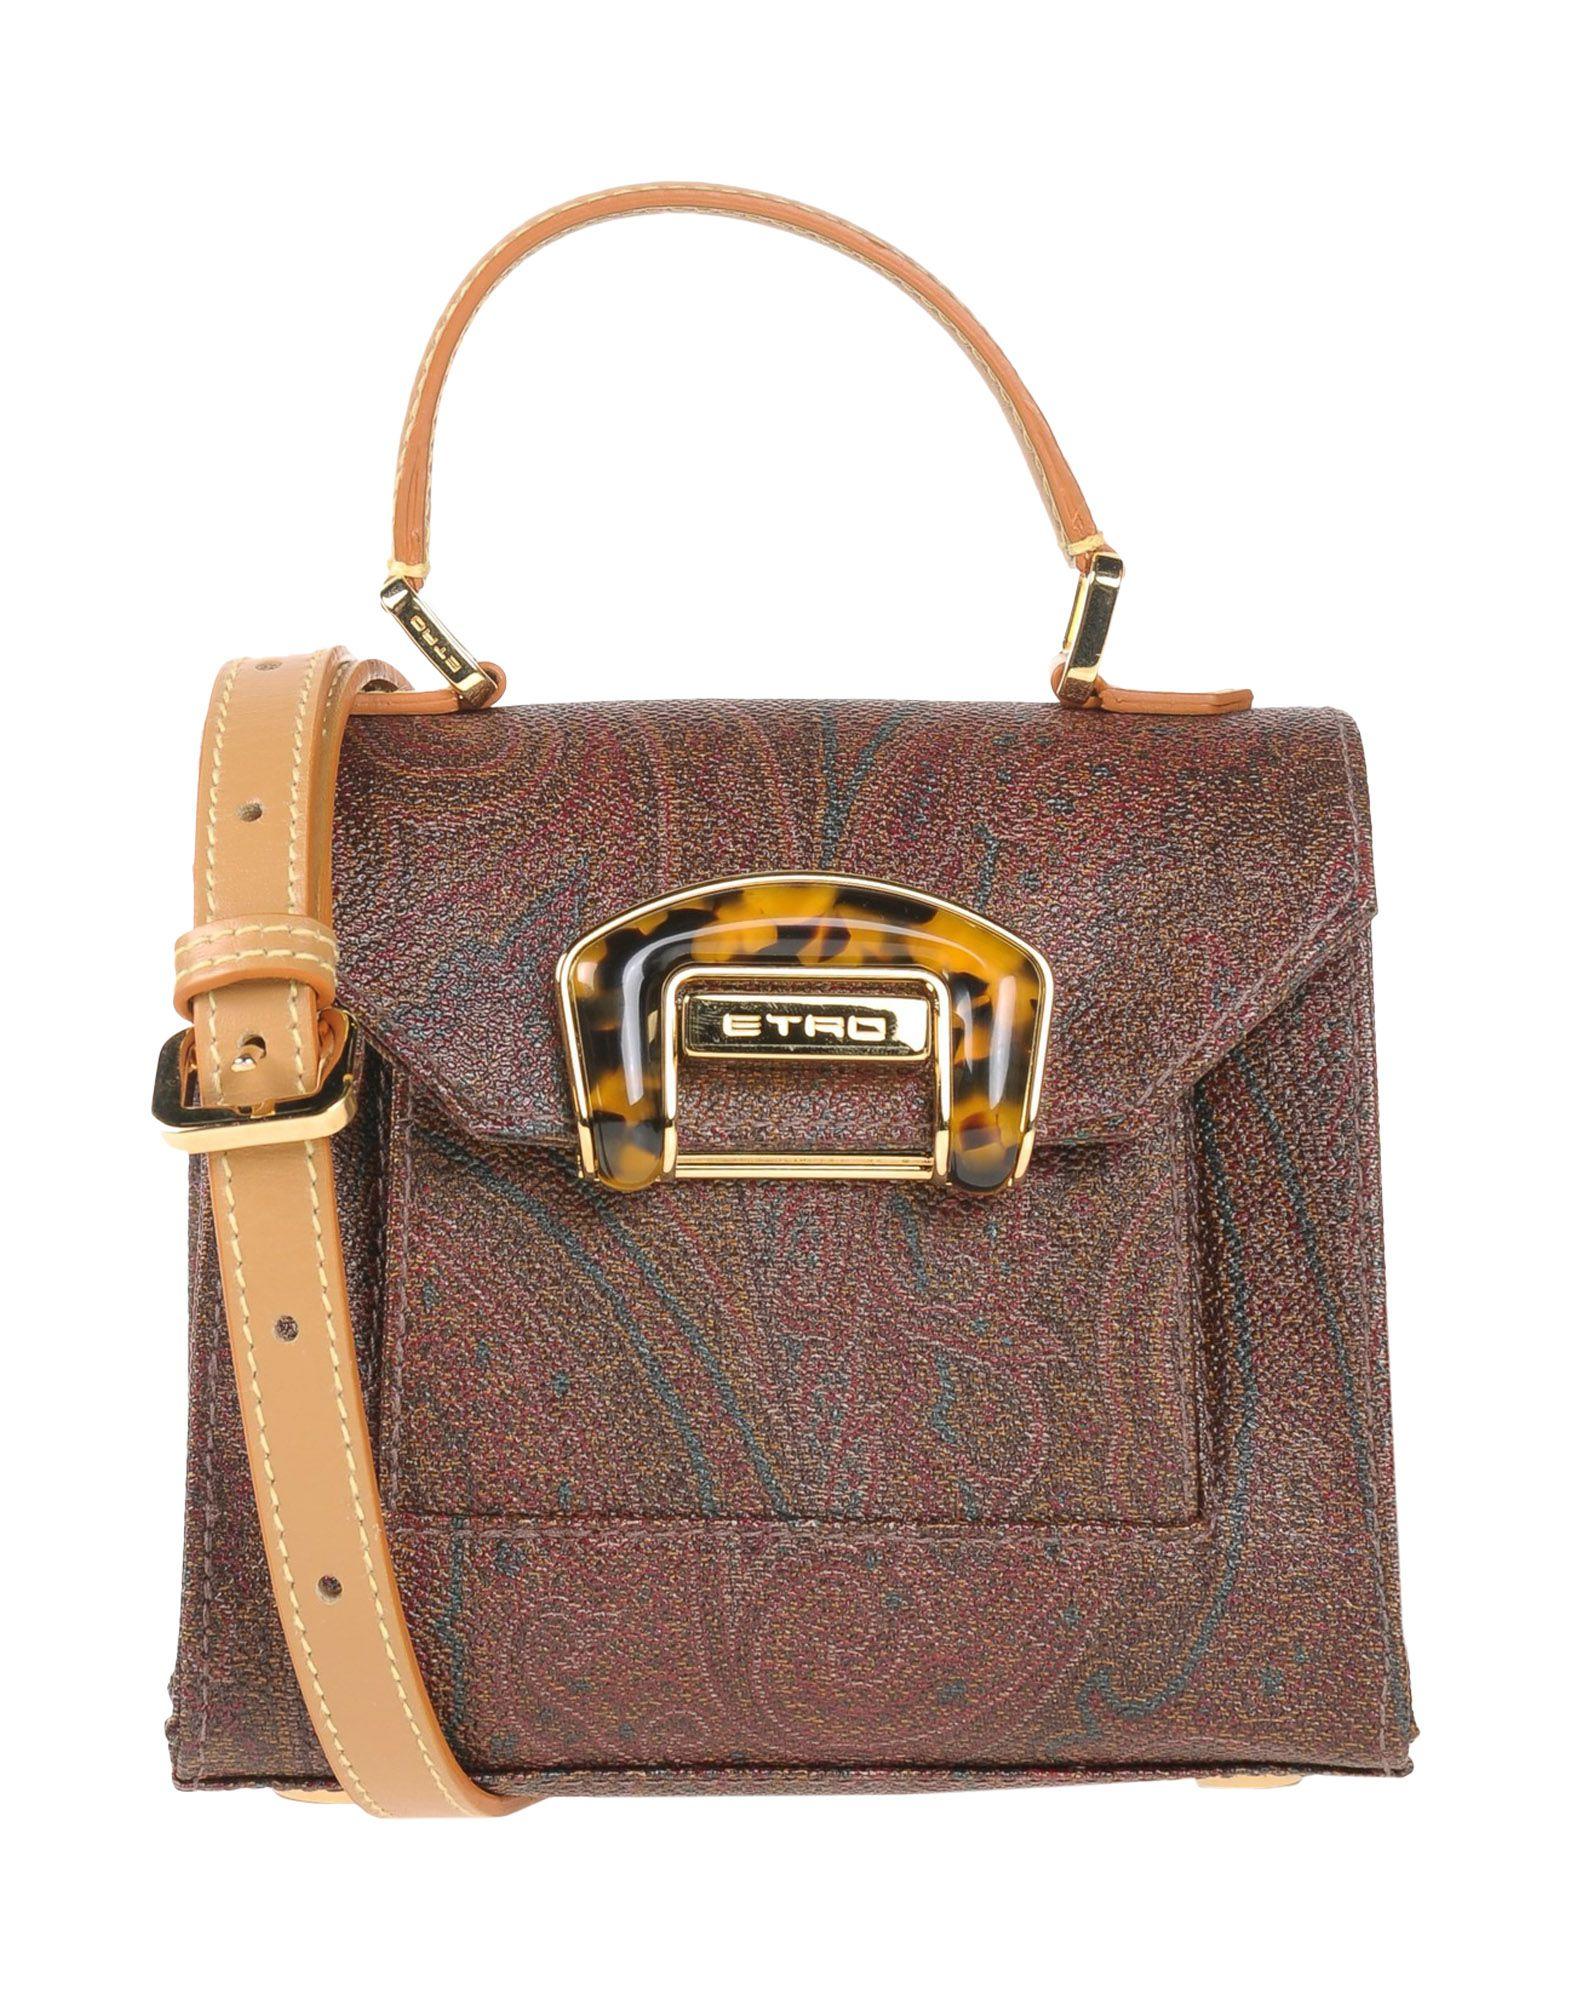 05199477f6f86 Lyst - Etro Handbag in Purple